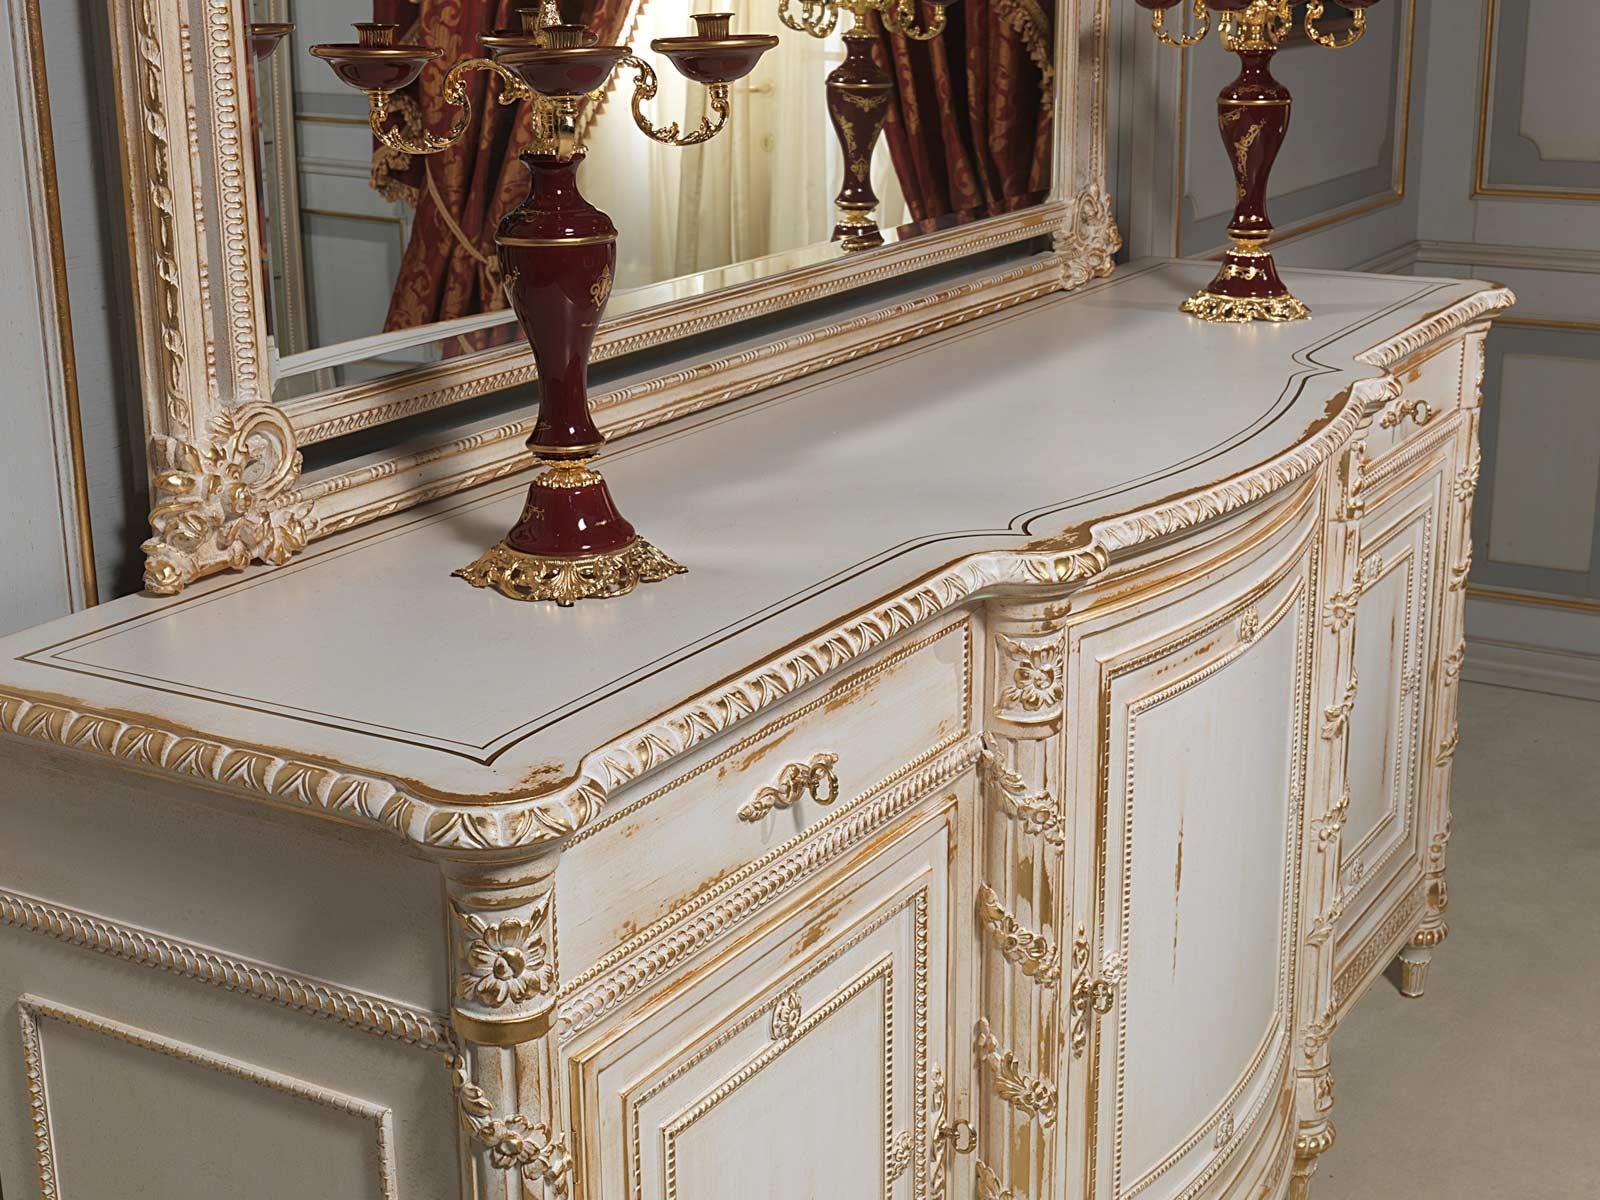 Carved Sideboard In Louis XVI